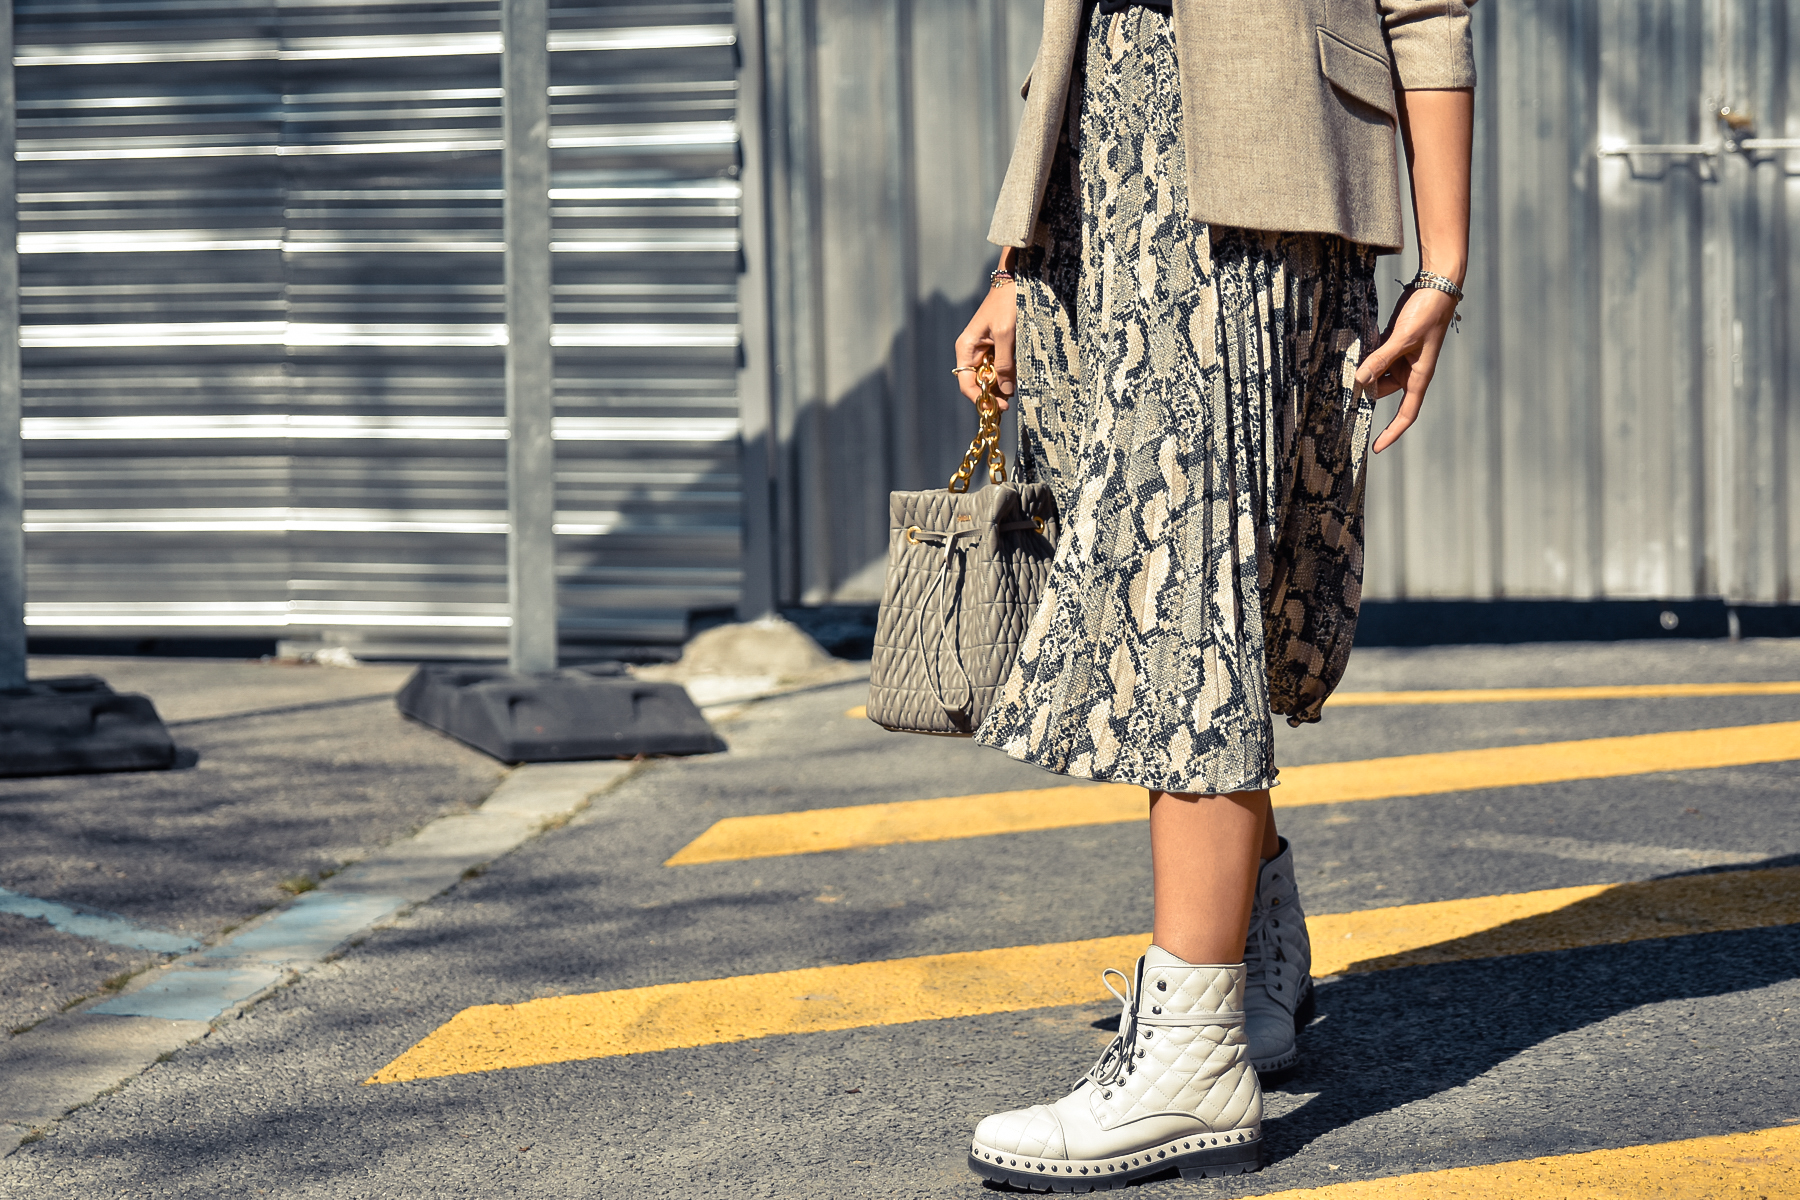 el-blog-de-silvia-look-falda-animal-print-balzer-02